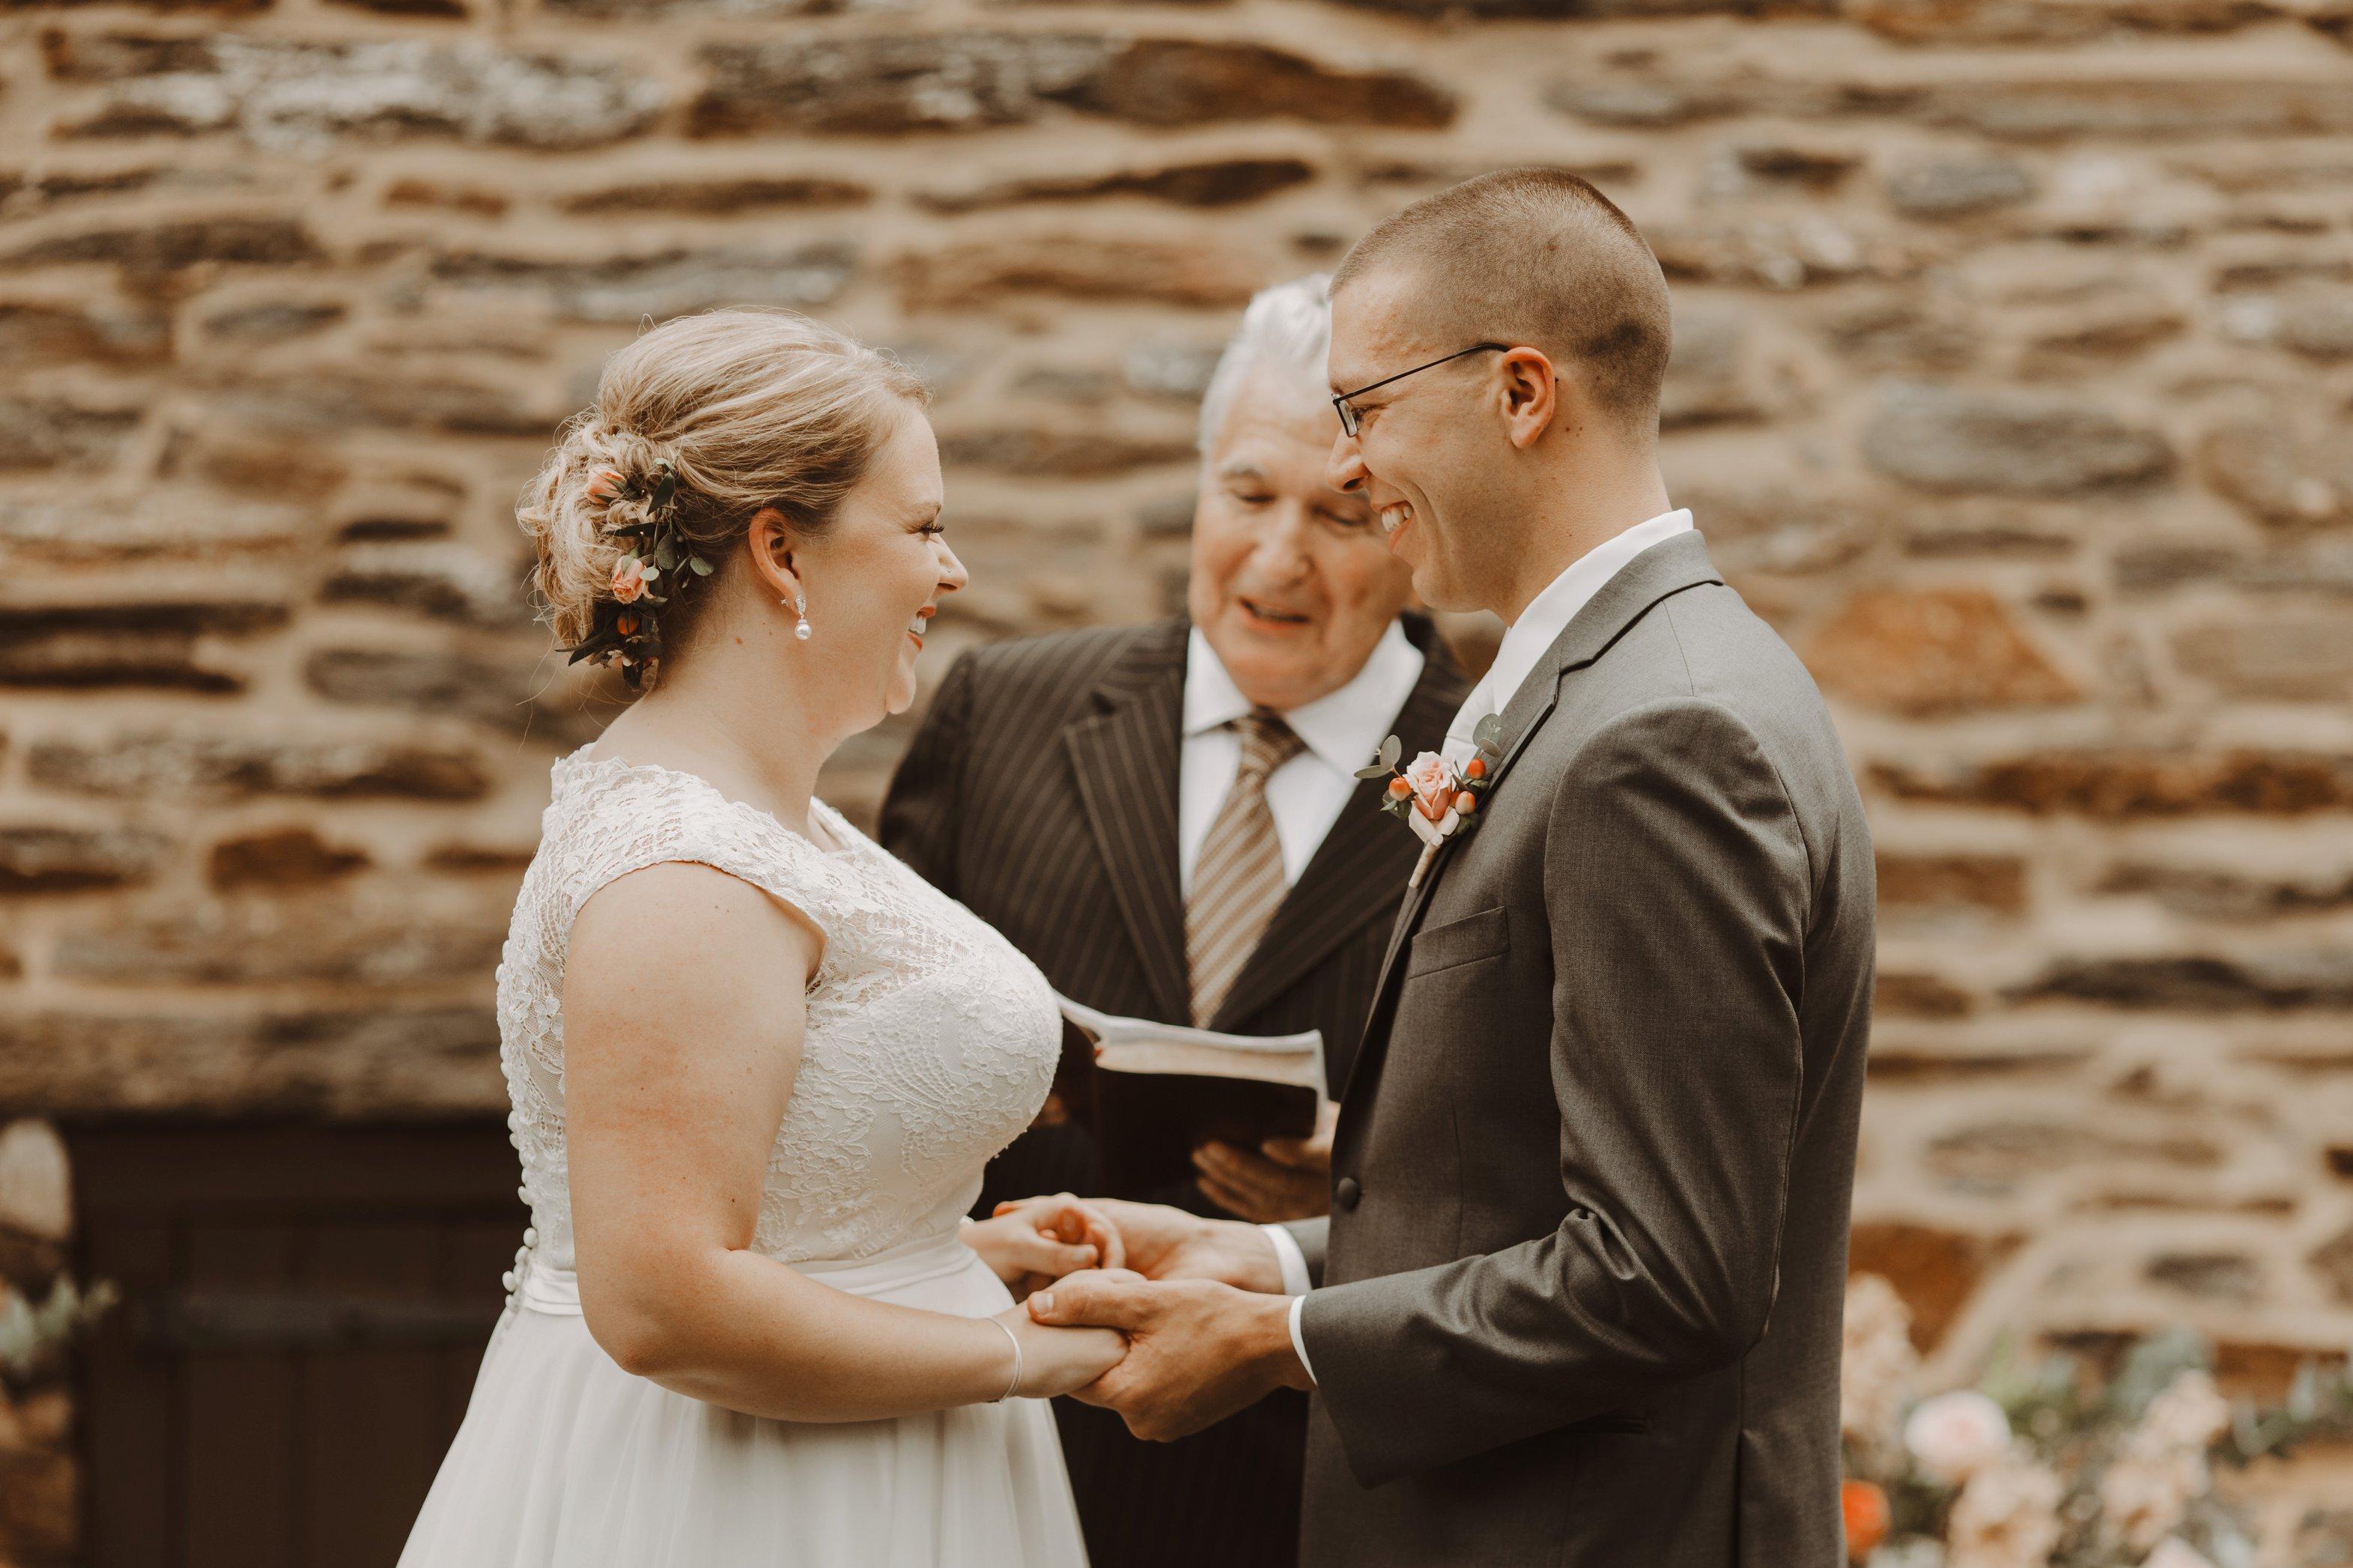 Historic Waverly Mansion emotional intimate outdoor wedding ceremony Baltimore Maryland wedding photographer